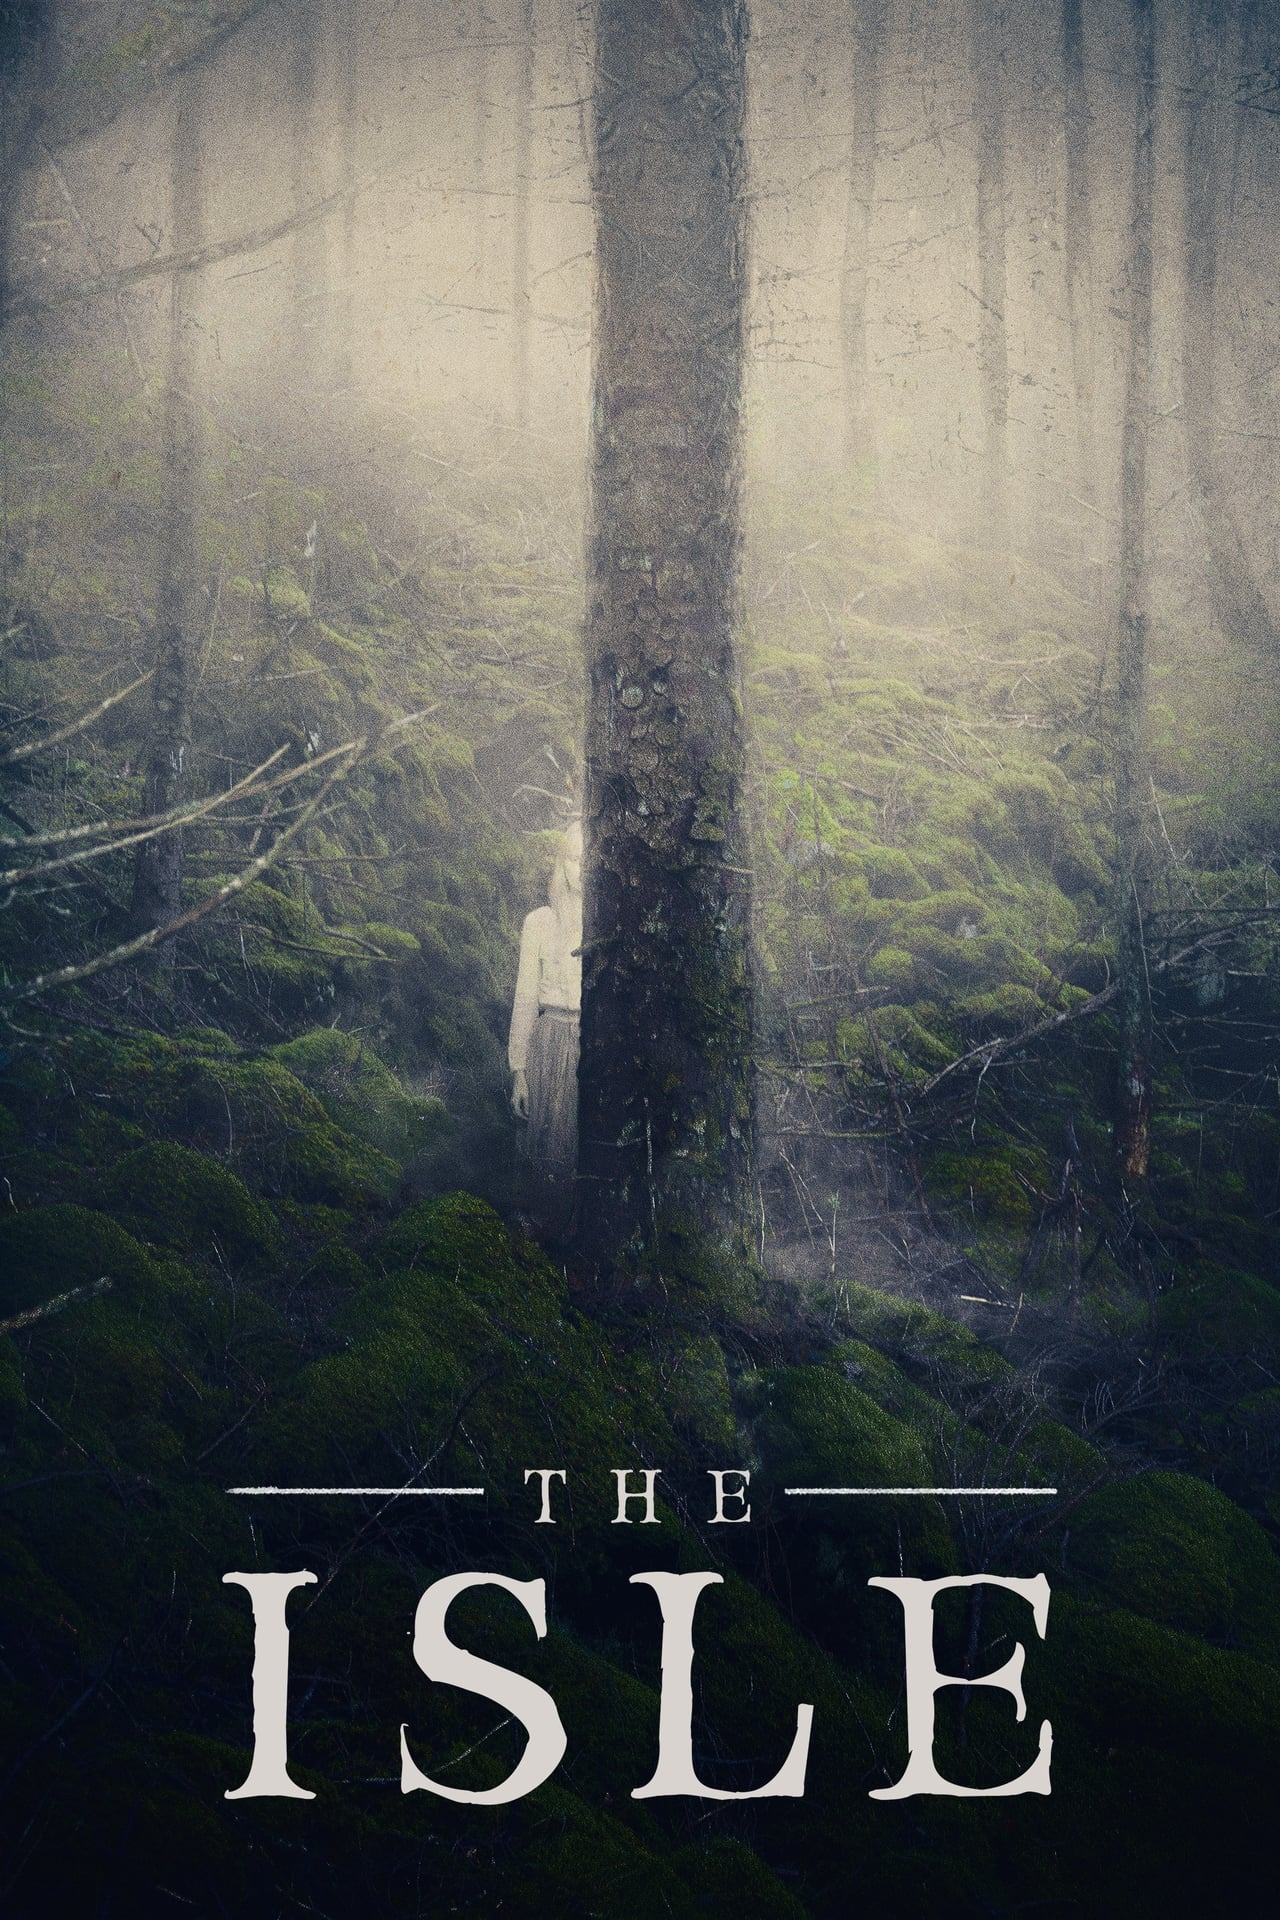 The Isle image